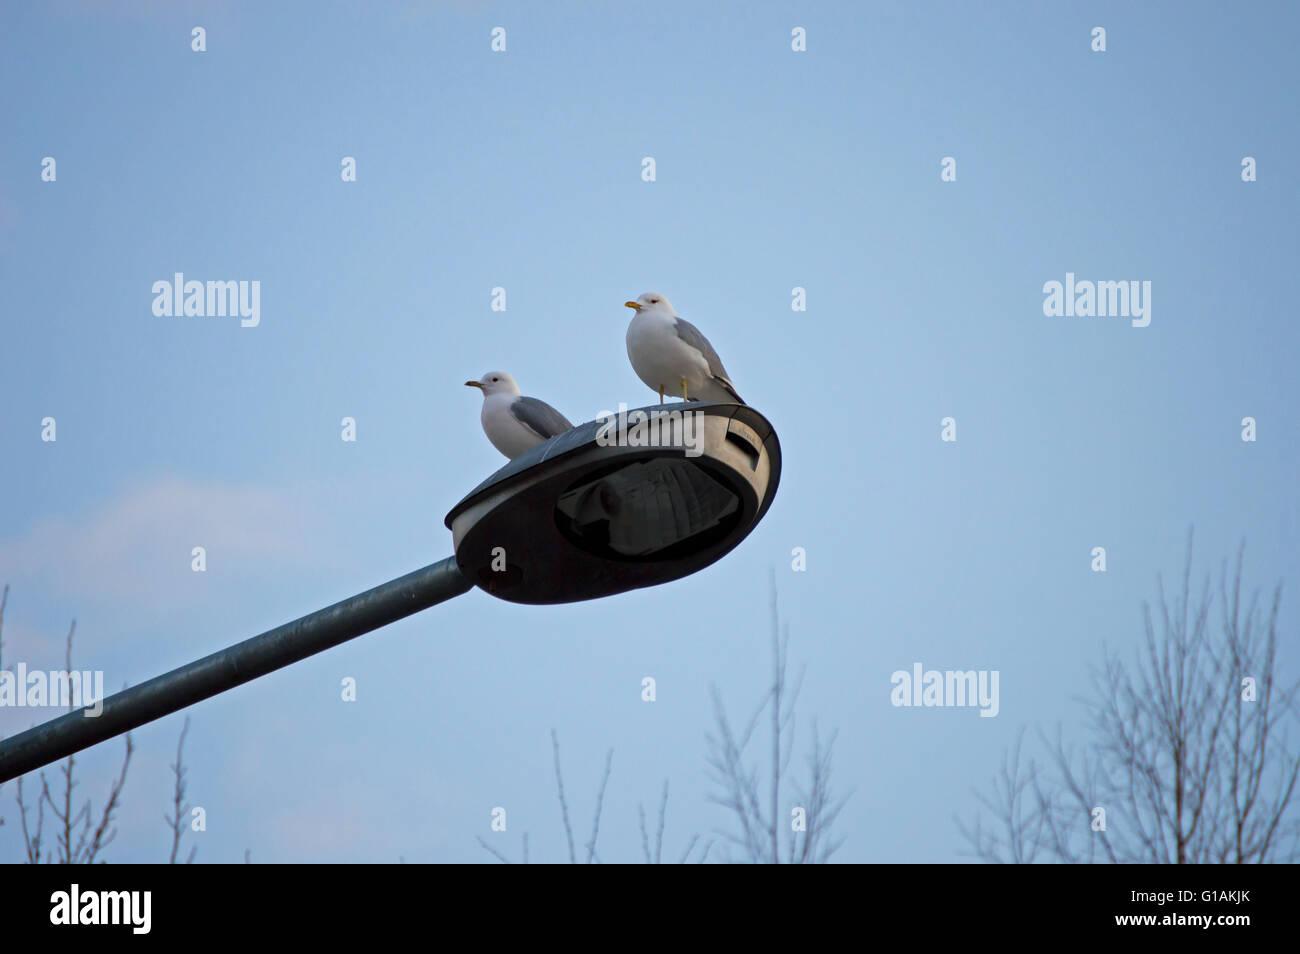 Seagull on streetlamp - Stock Image